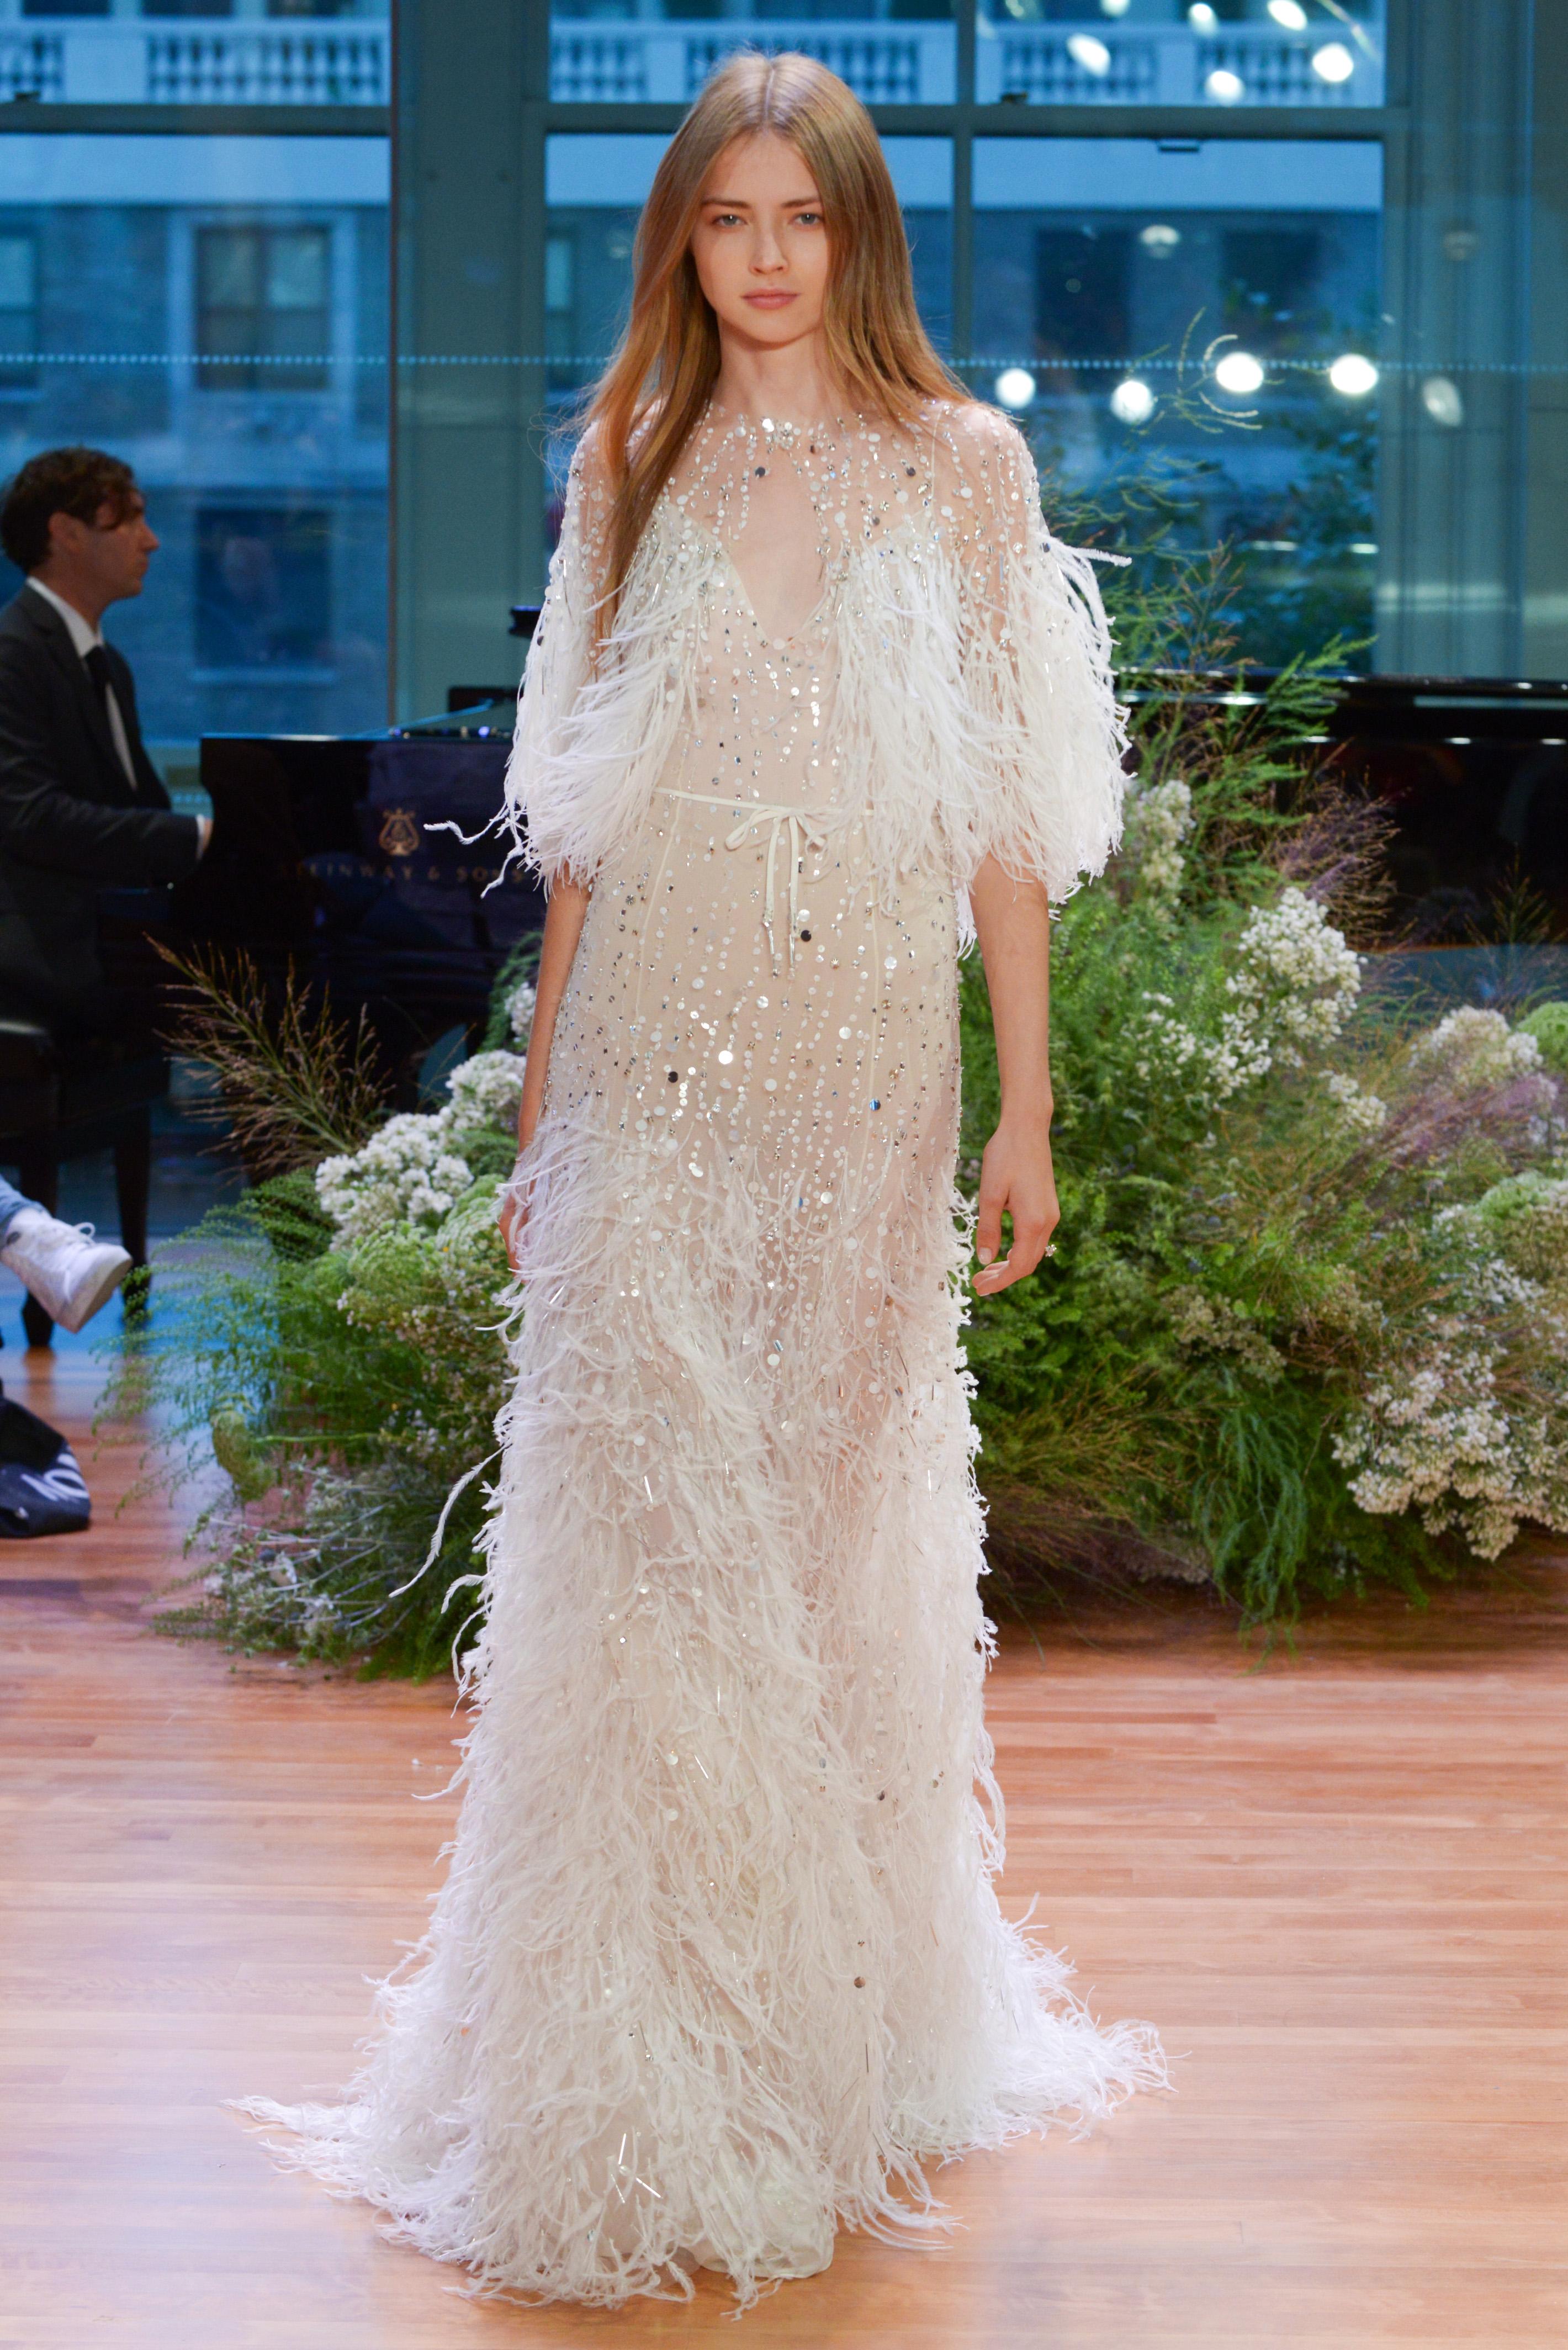 Monique Lhuillier Fall 2017 Wedding Dress Collection